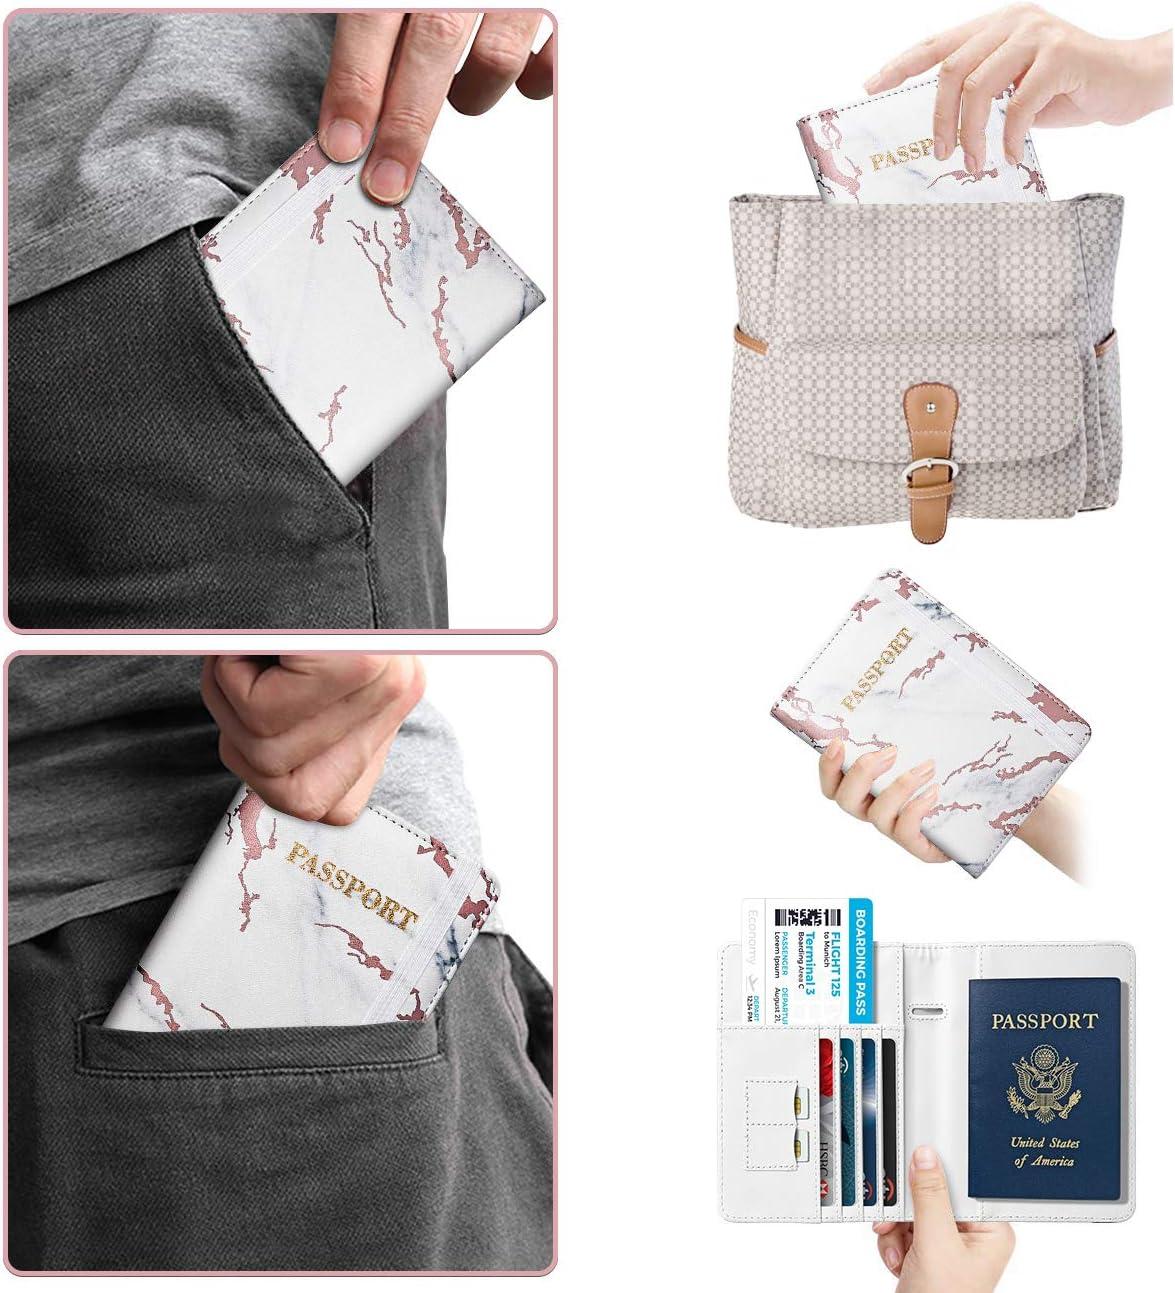 Cartera de Cuero de Pasaporte Unisex con 4 Ranuras para Tarjetas Supgear Funda de Pasaporte Porta Pasaporte para Tarjeta de Cr/édito y Billete Cactus